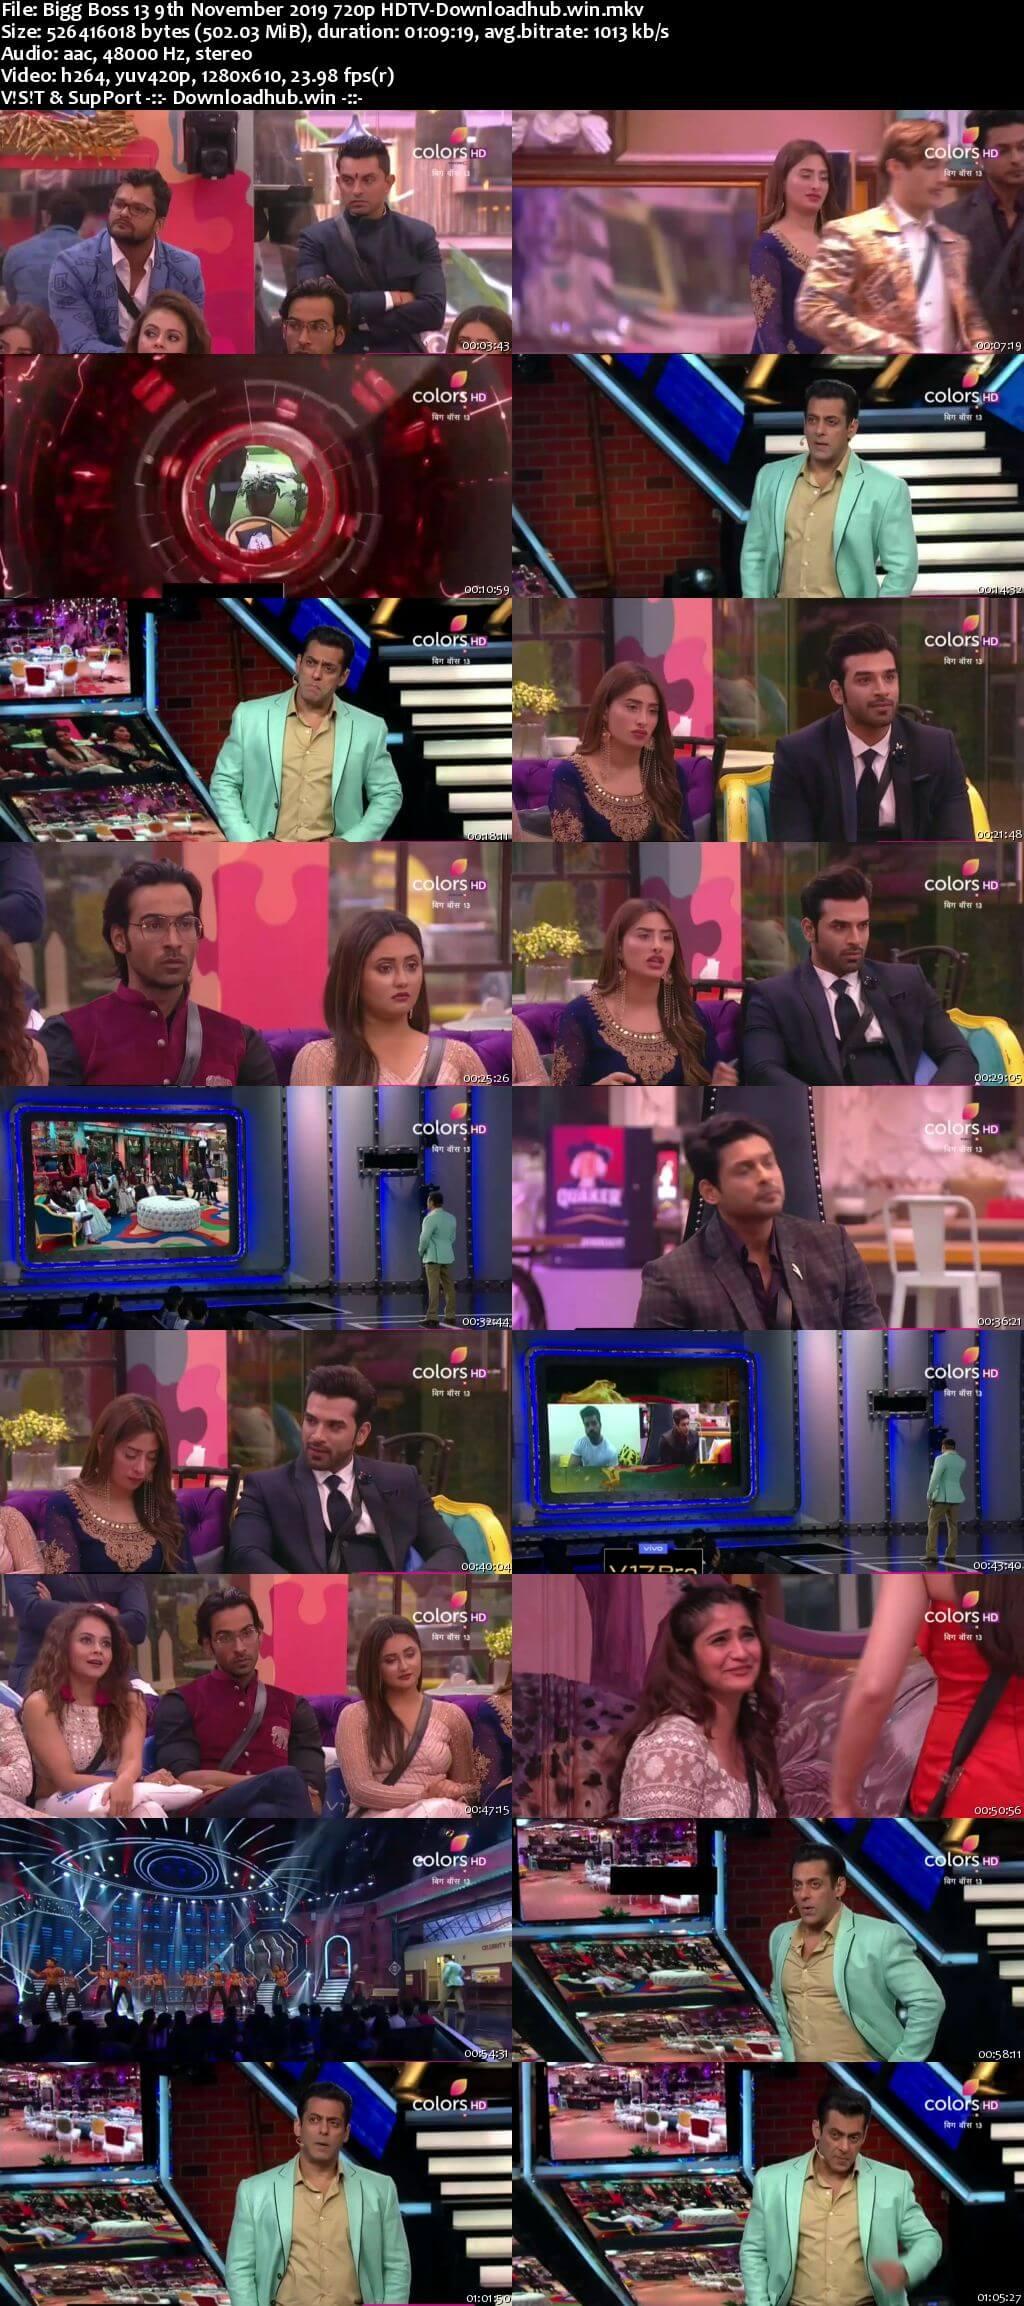 Bigg Boss 13 09 November 2019 Episode 40 HDTV 720p 480p